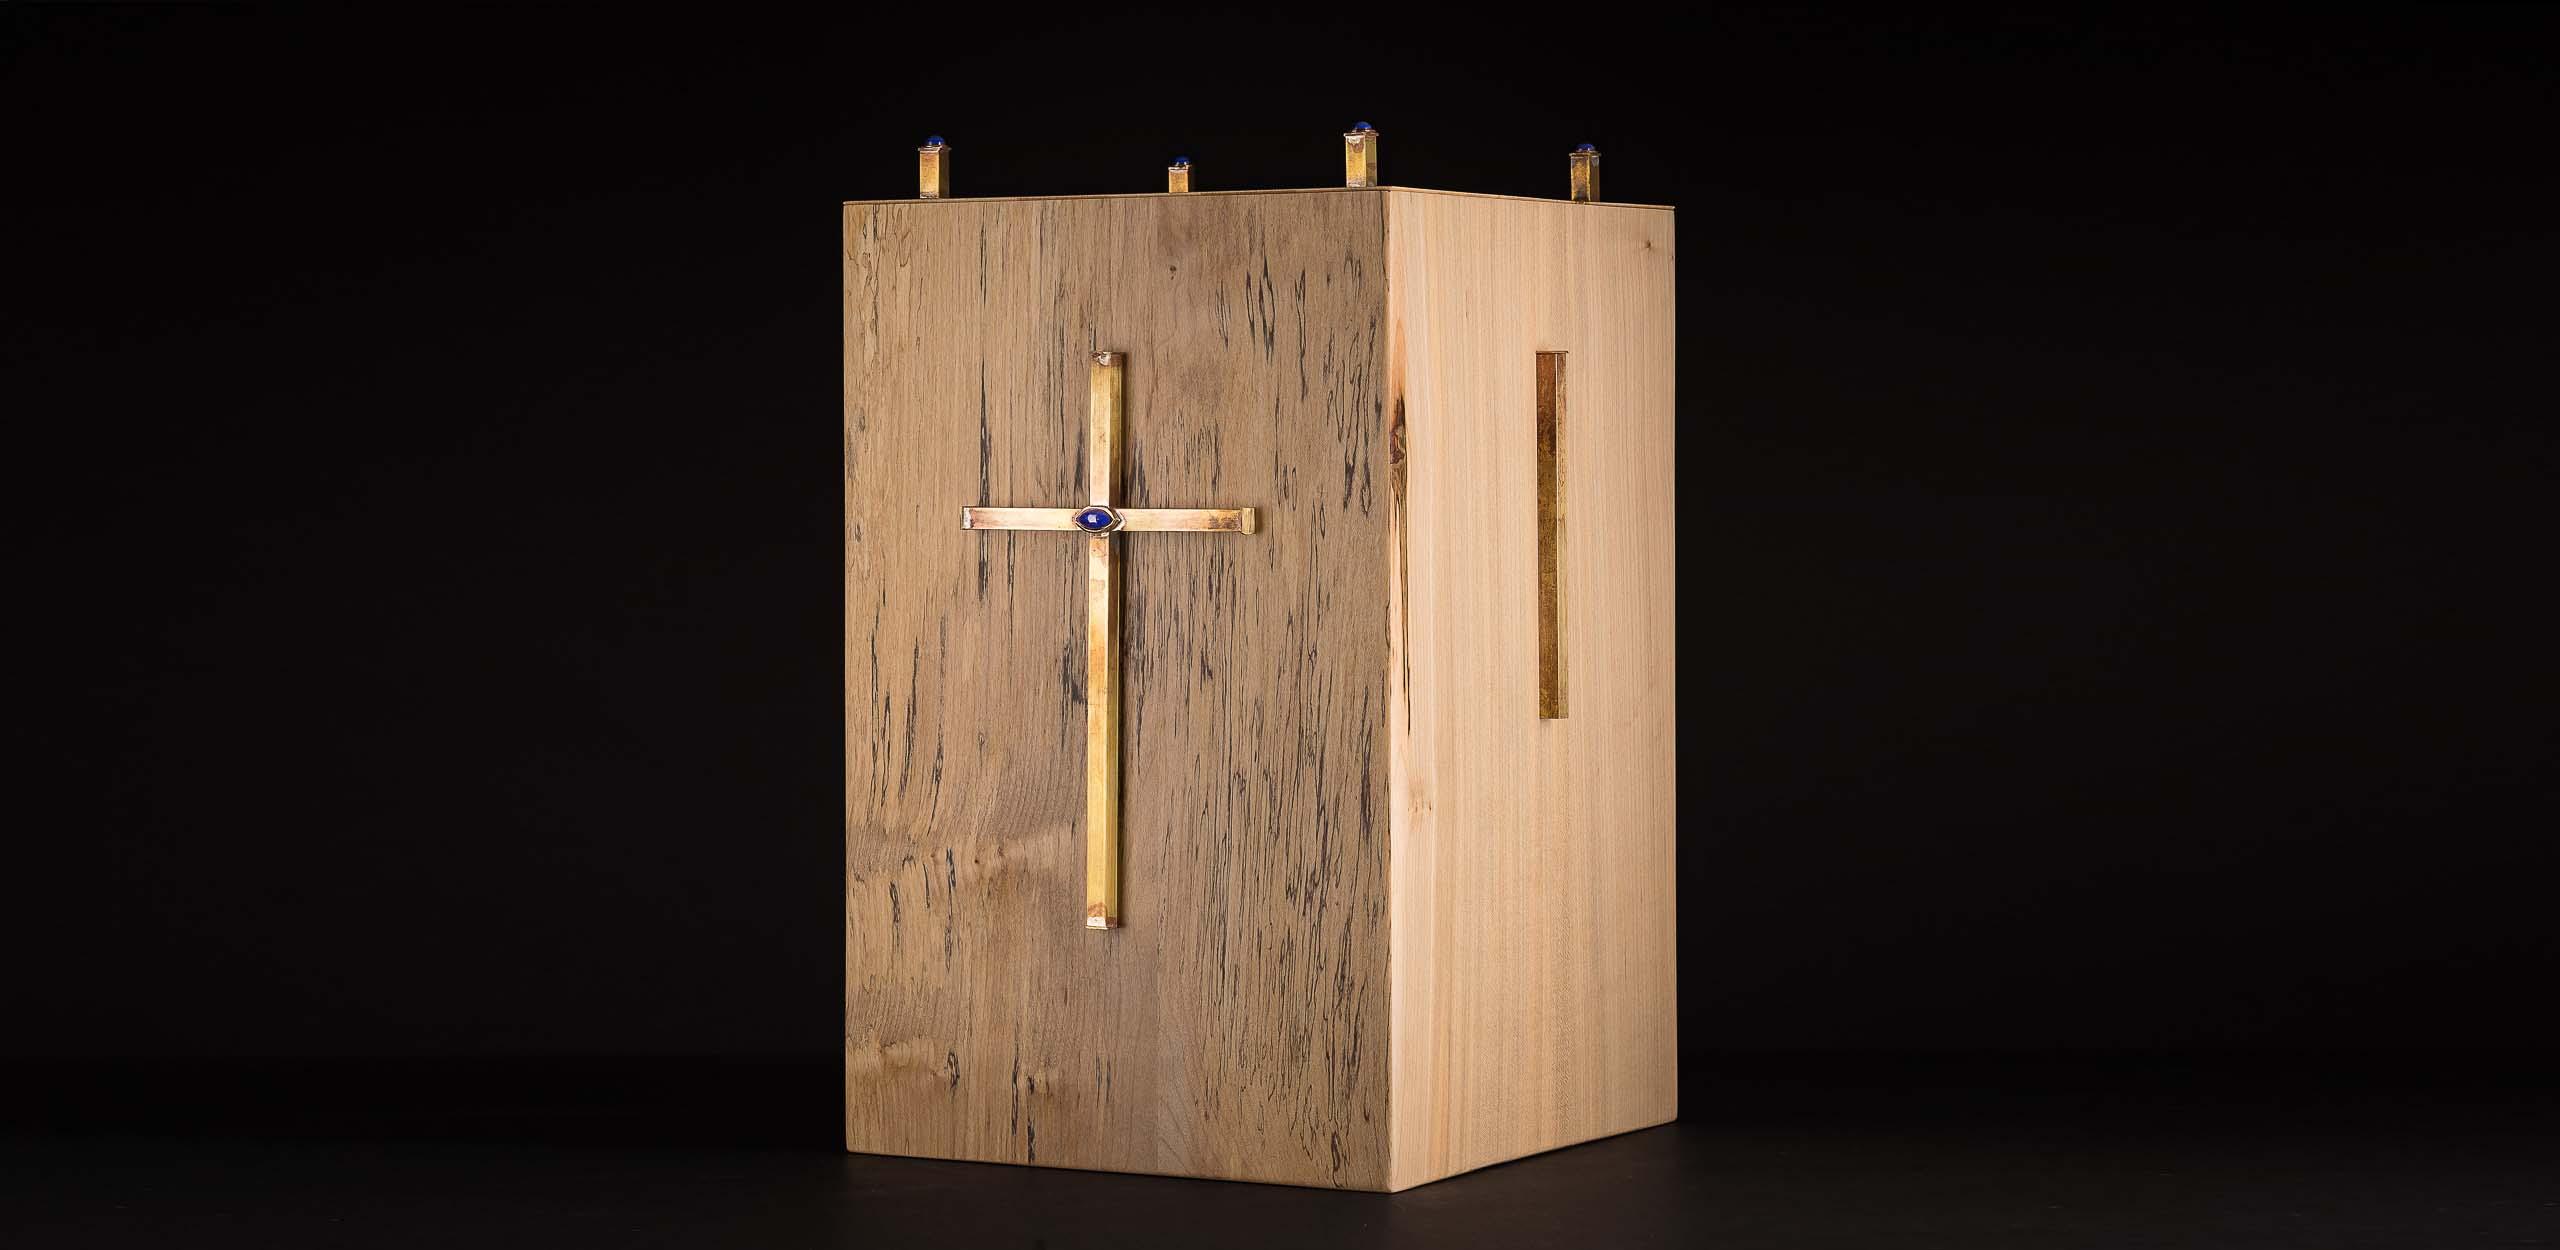 Urne aus AHorn-Holz, Messing, Lapislazuli